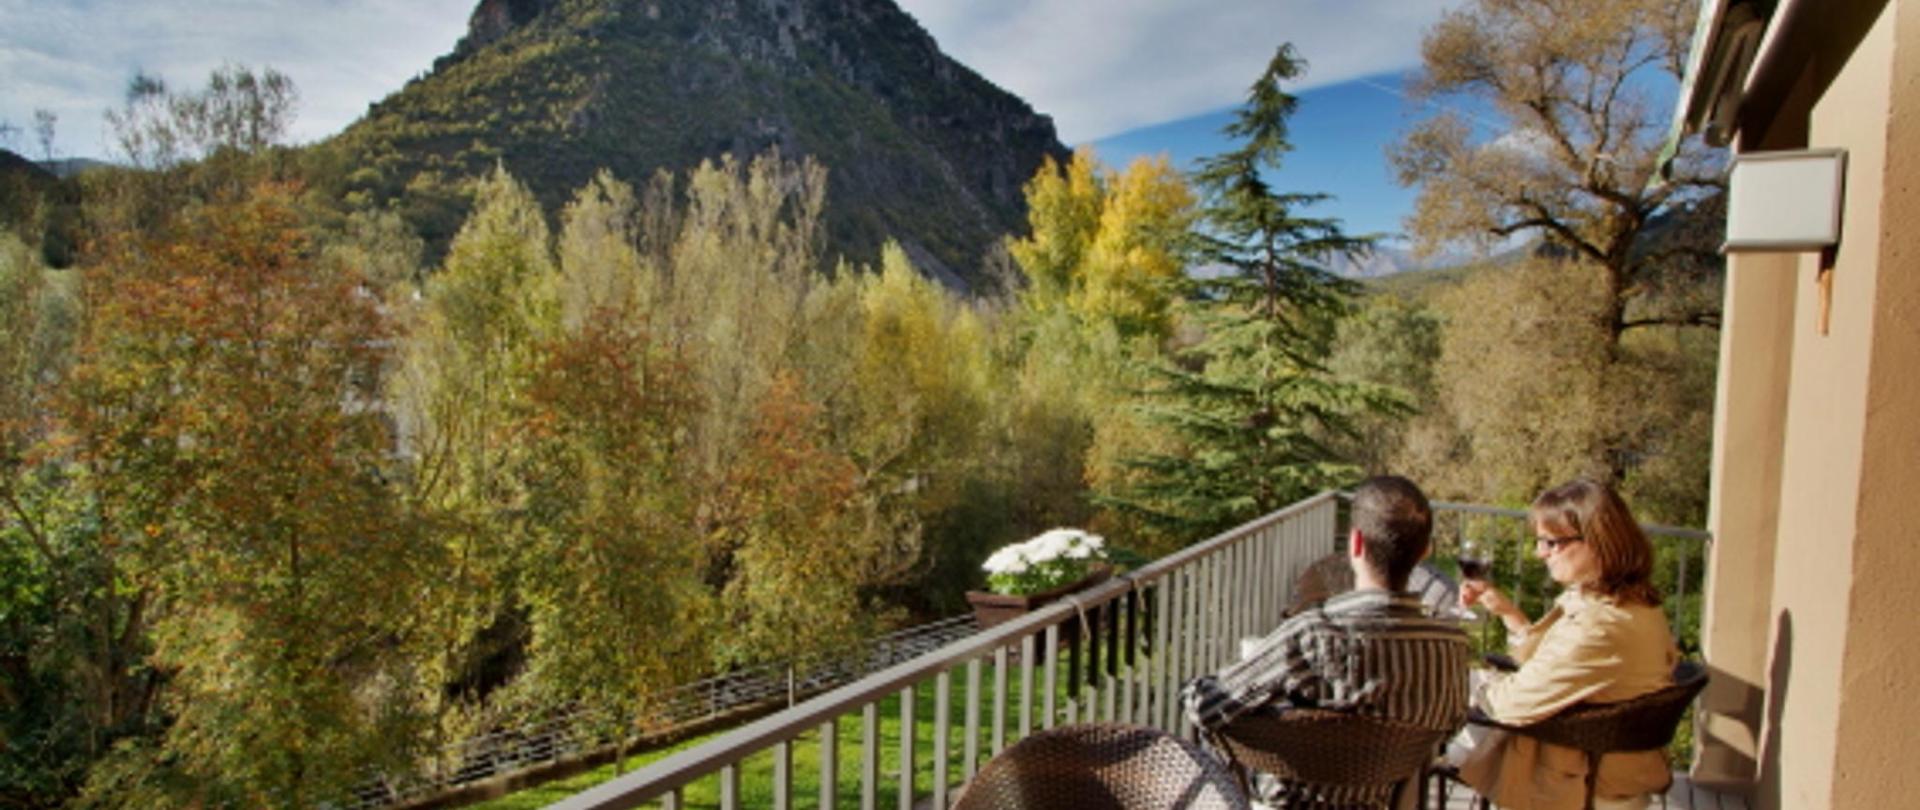 HOTEL COTORI 37 - Foto Sergi Ricart BR.JPG